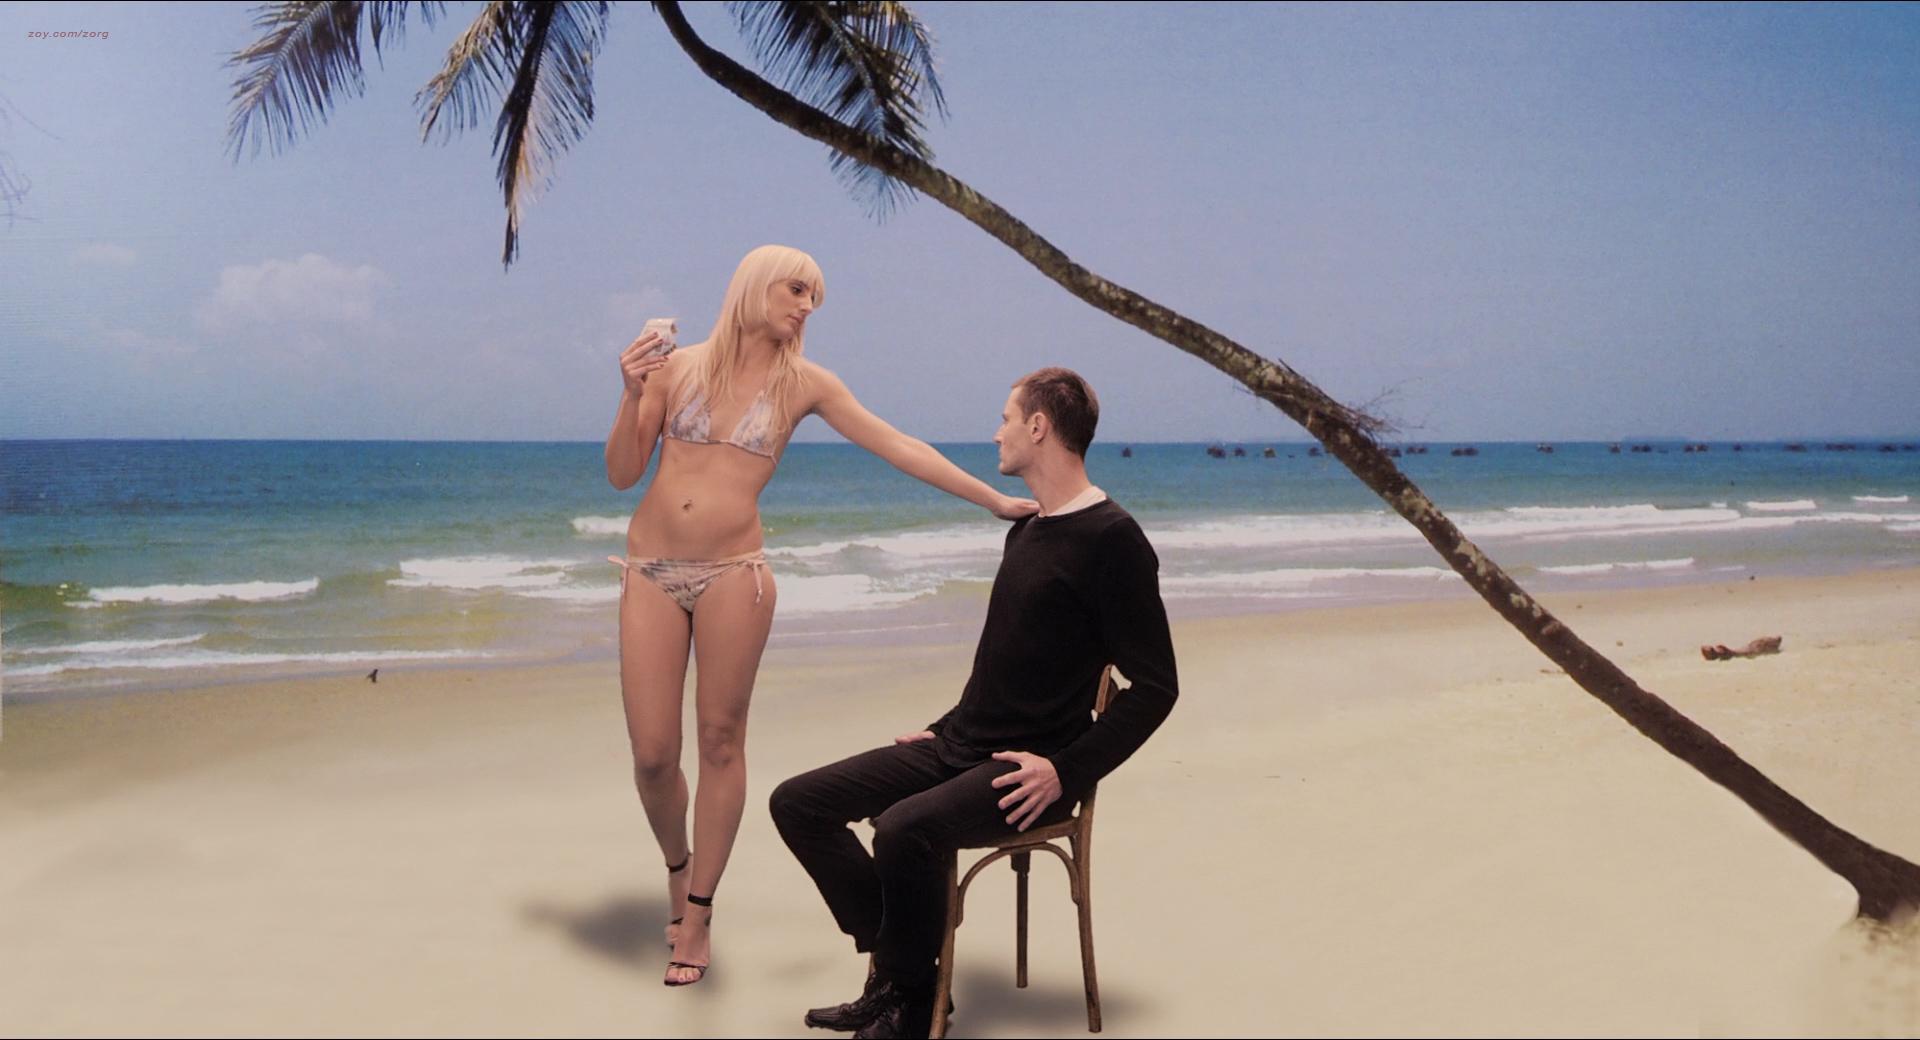 Ewa Matula nude busty boobs Karolina Korta hot others nude butt - Onirica (PL-2014) HD 1080p BluRay (3)